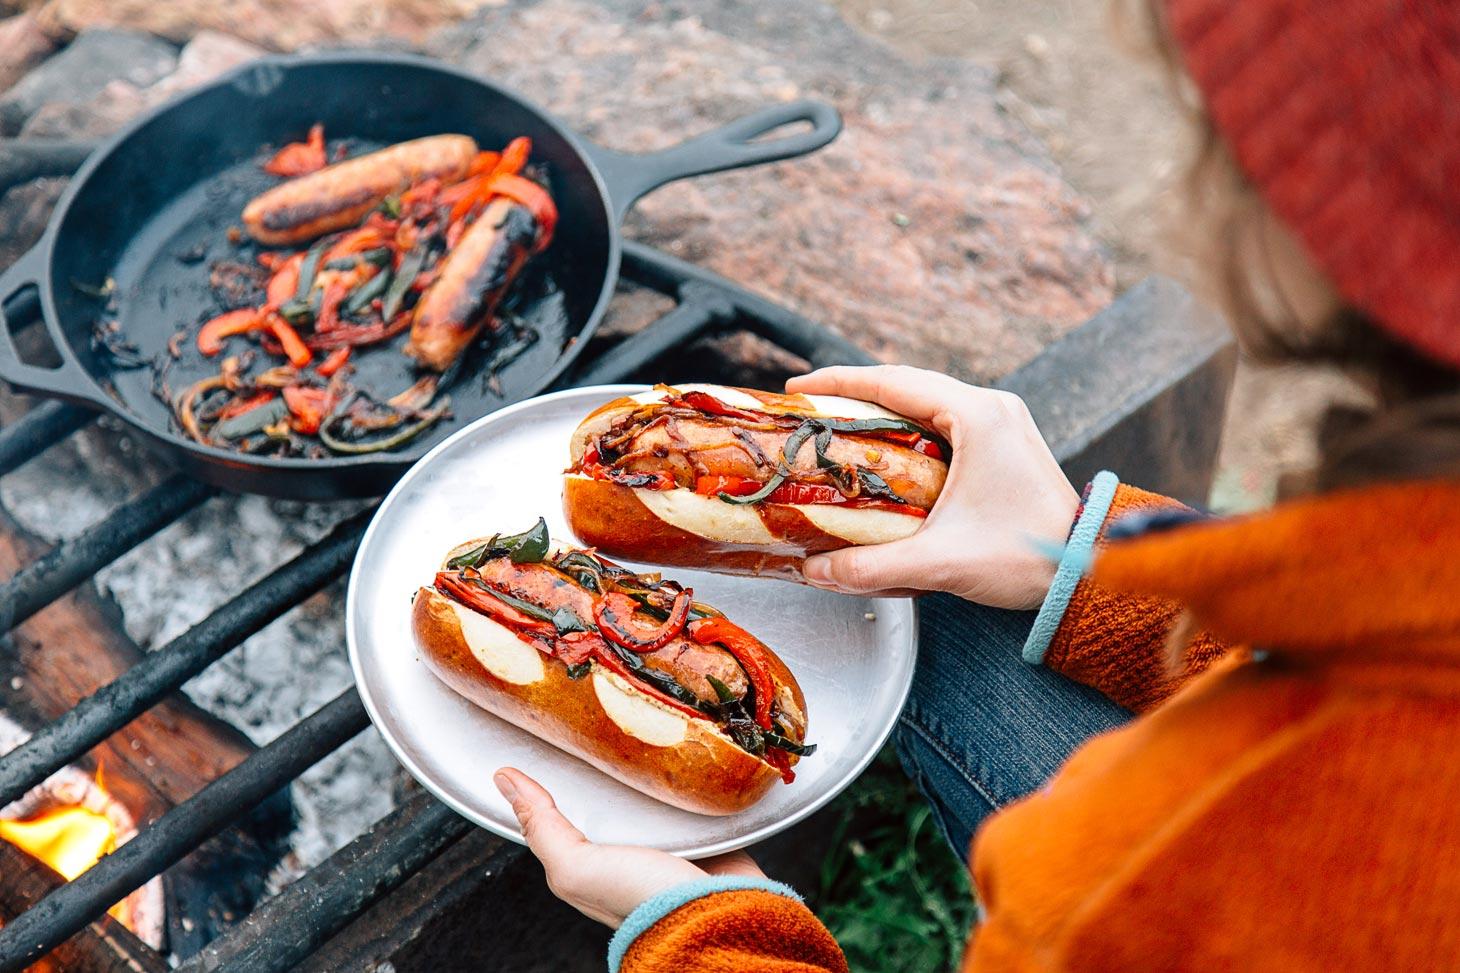 Megan holding a plate with a bratwurst in a pretzel bun near a campfire.